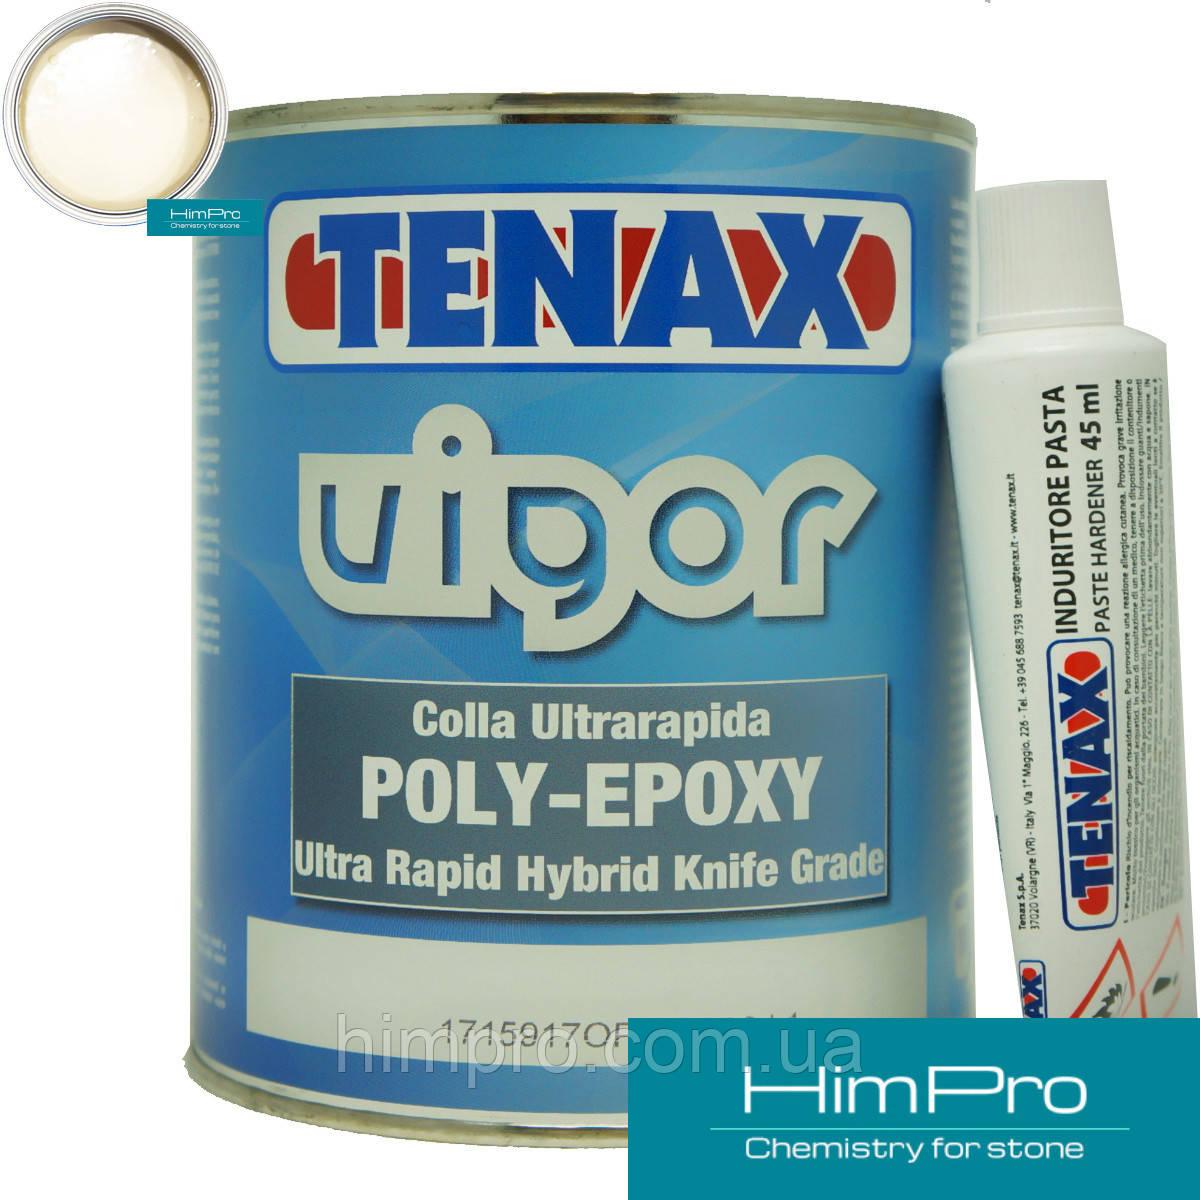 VIGOR paglierino 1L Tenax бежевый Полиэфирно-эпоксидный клей для мрамора, гранита